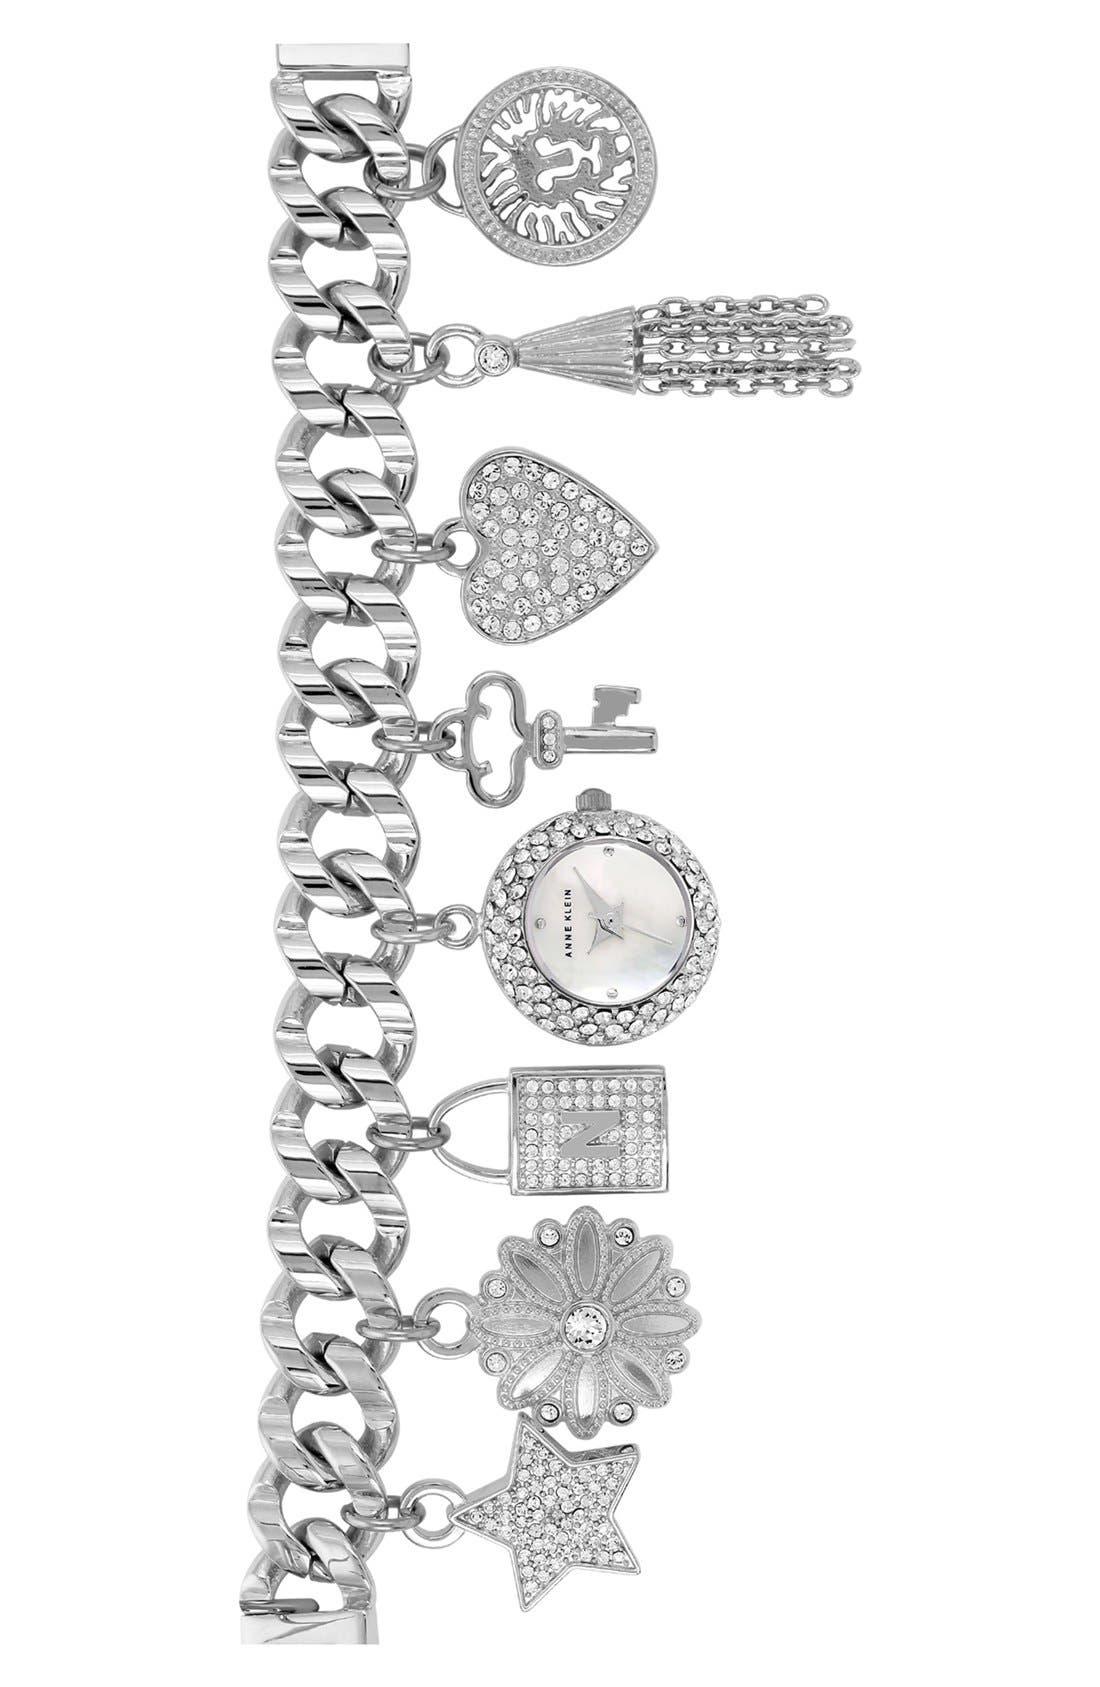 Main Image - Anne Klein Pavé Charm Bracelet Watch, 20mm (Nordstrom Exclusive)